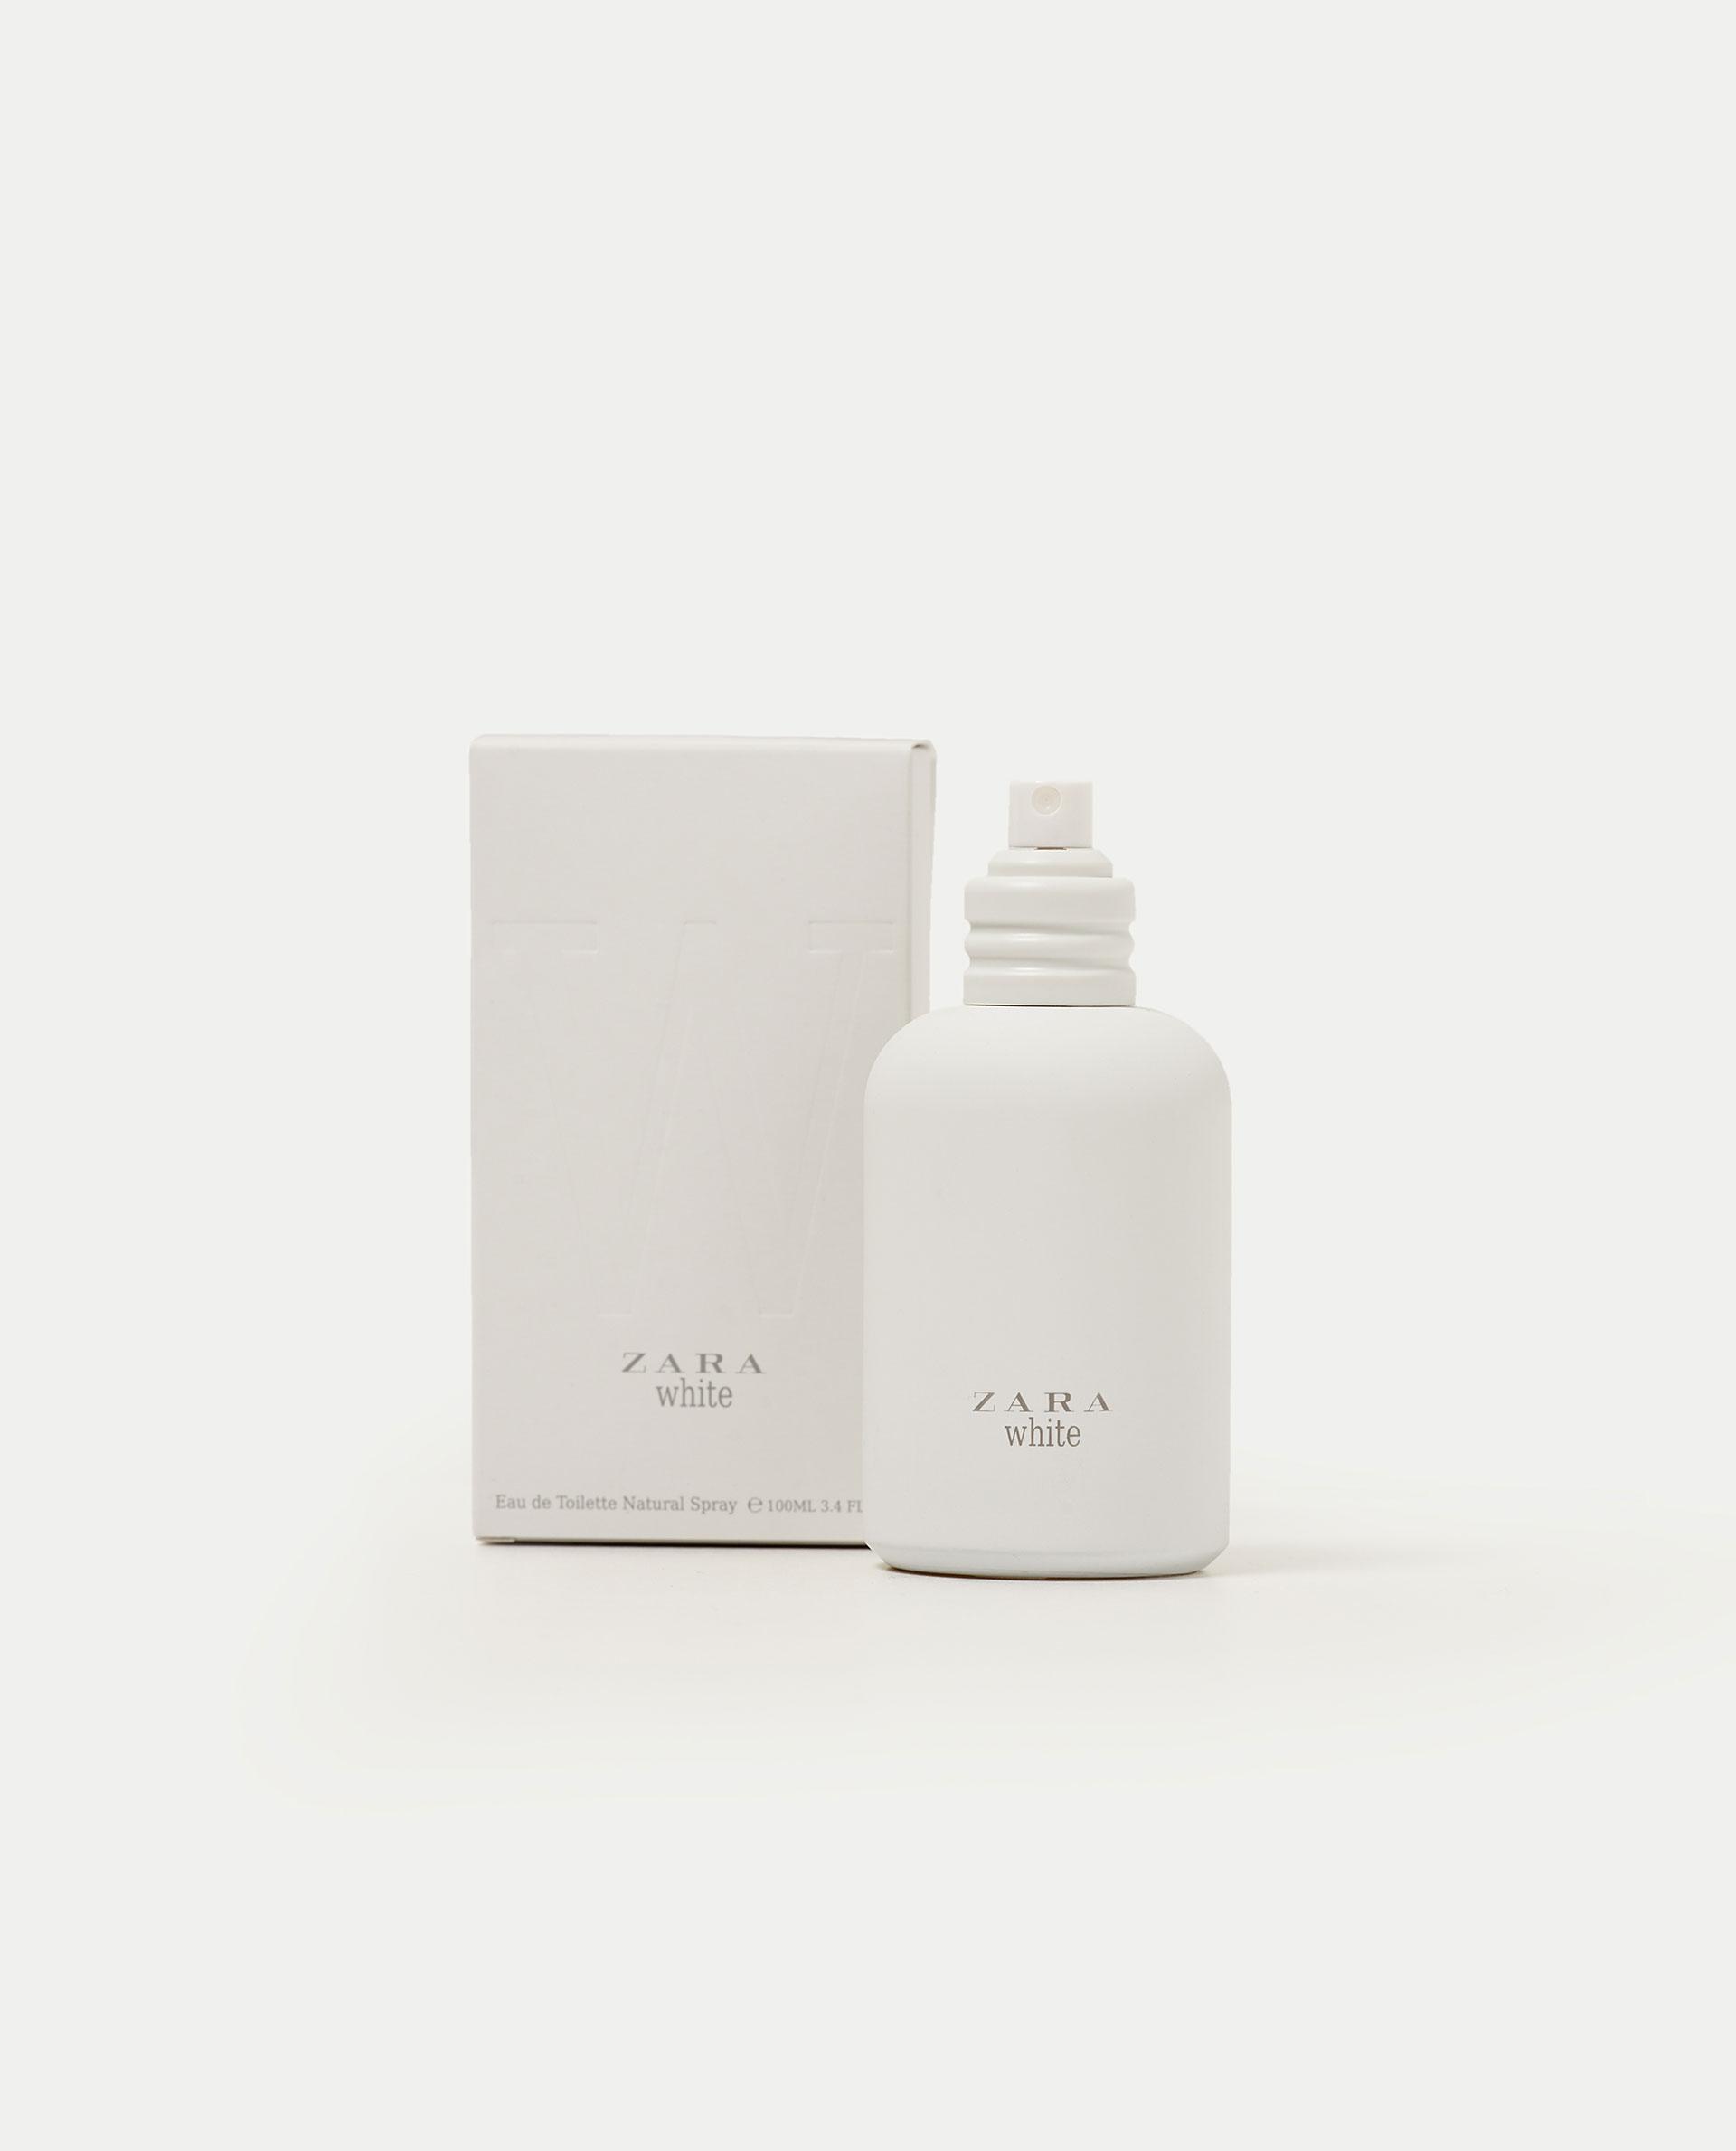 Zara White Zara Perfume A New Fragrance For Women 2017